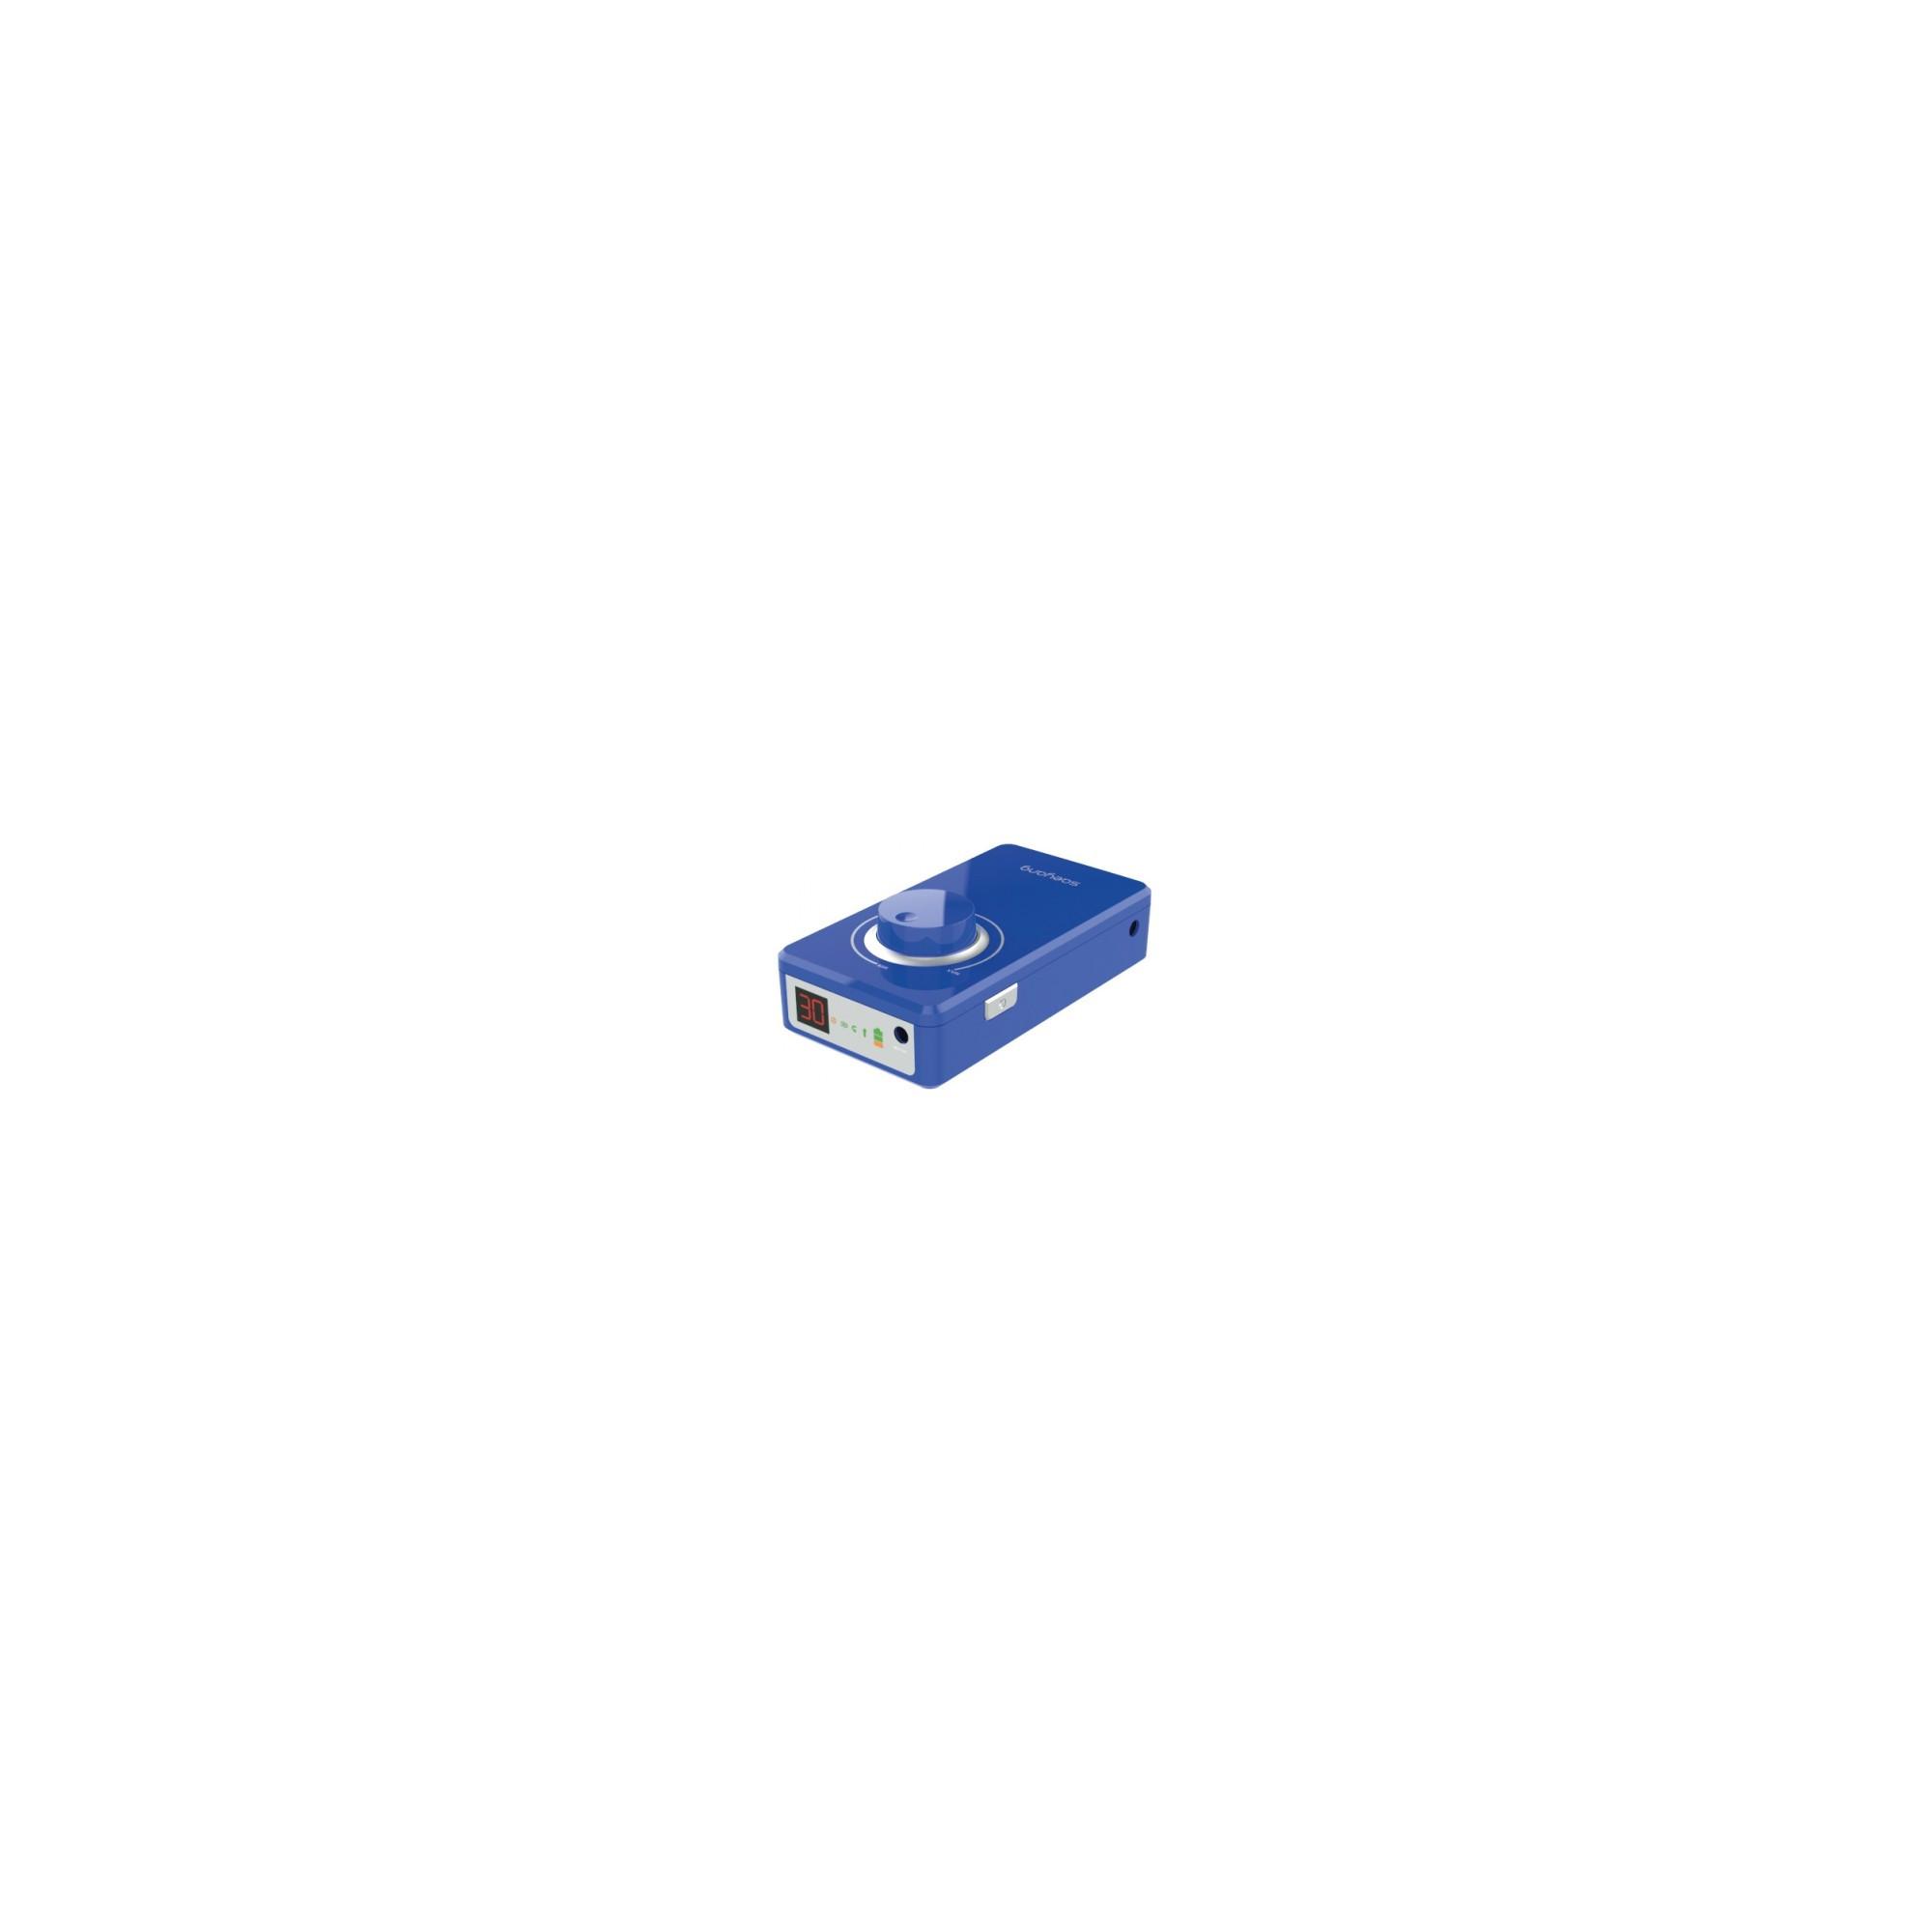 "Starting pack étudiant ""soins à domiciles"" - 1 micromoteur K38 Bleu + Kit instruments"